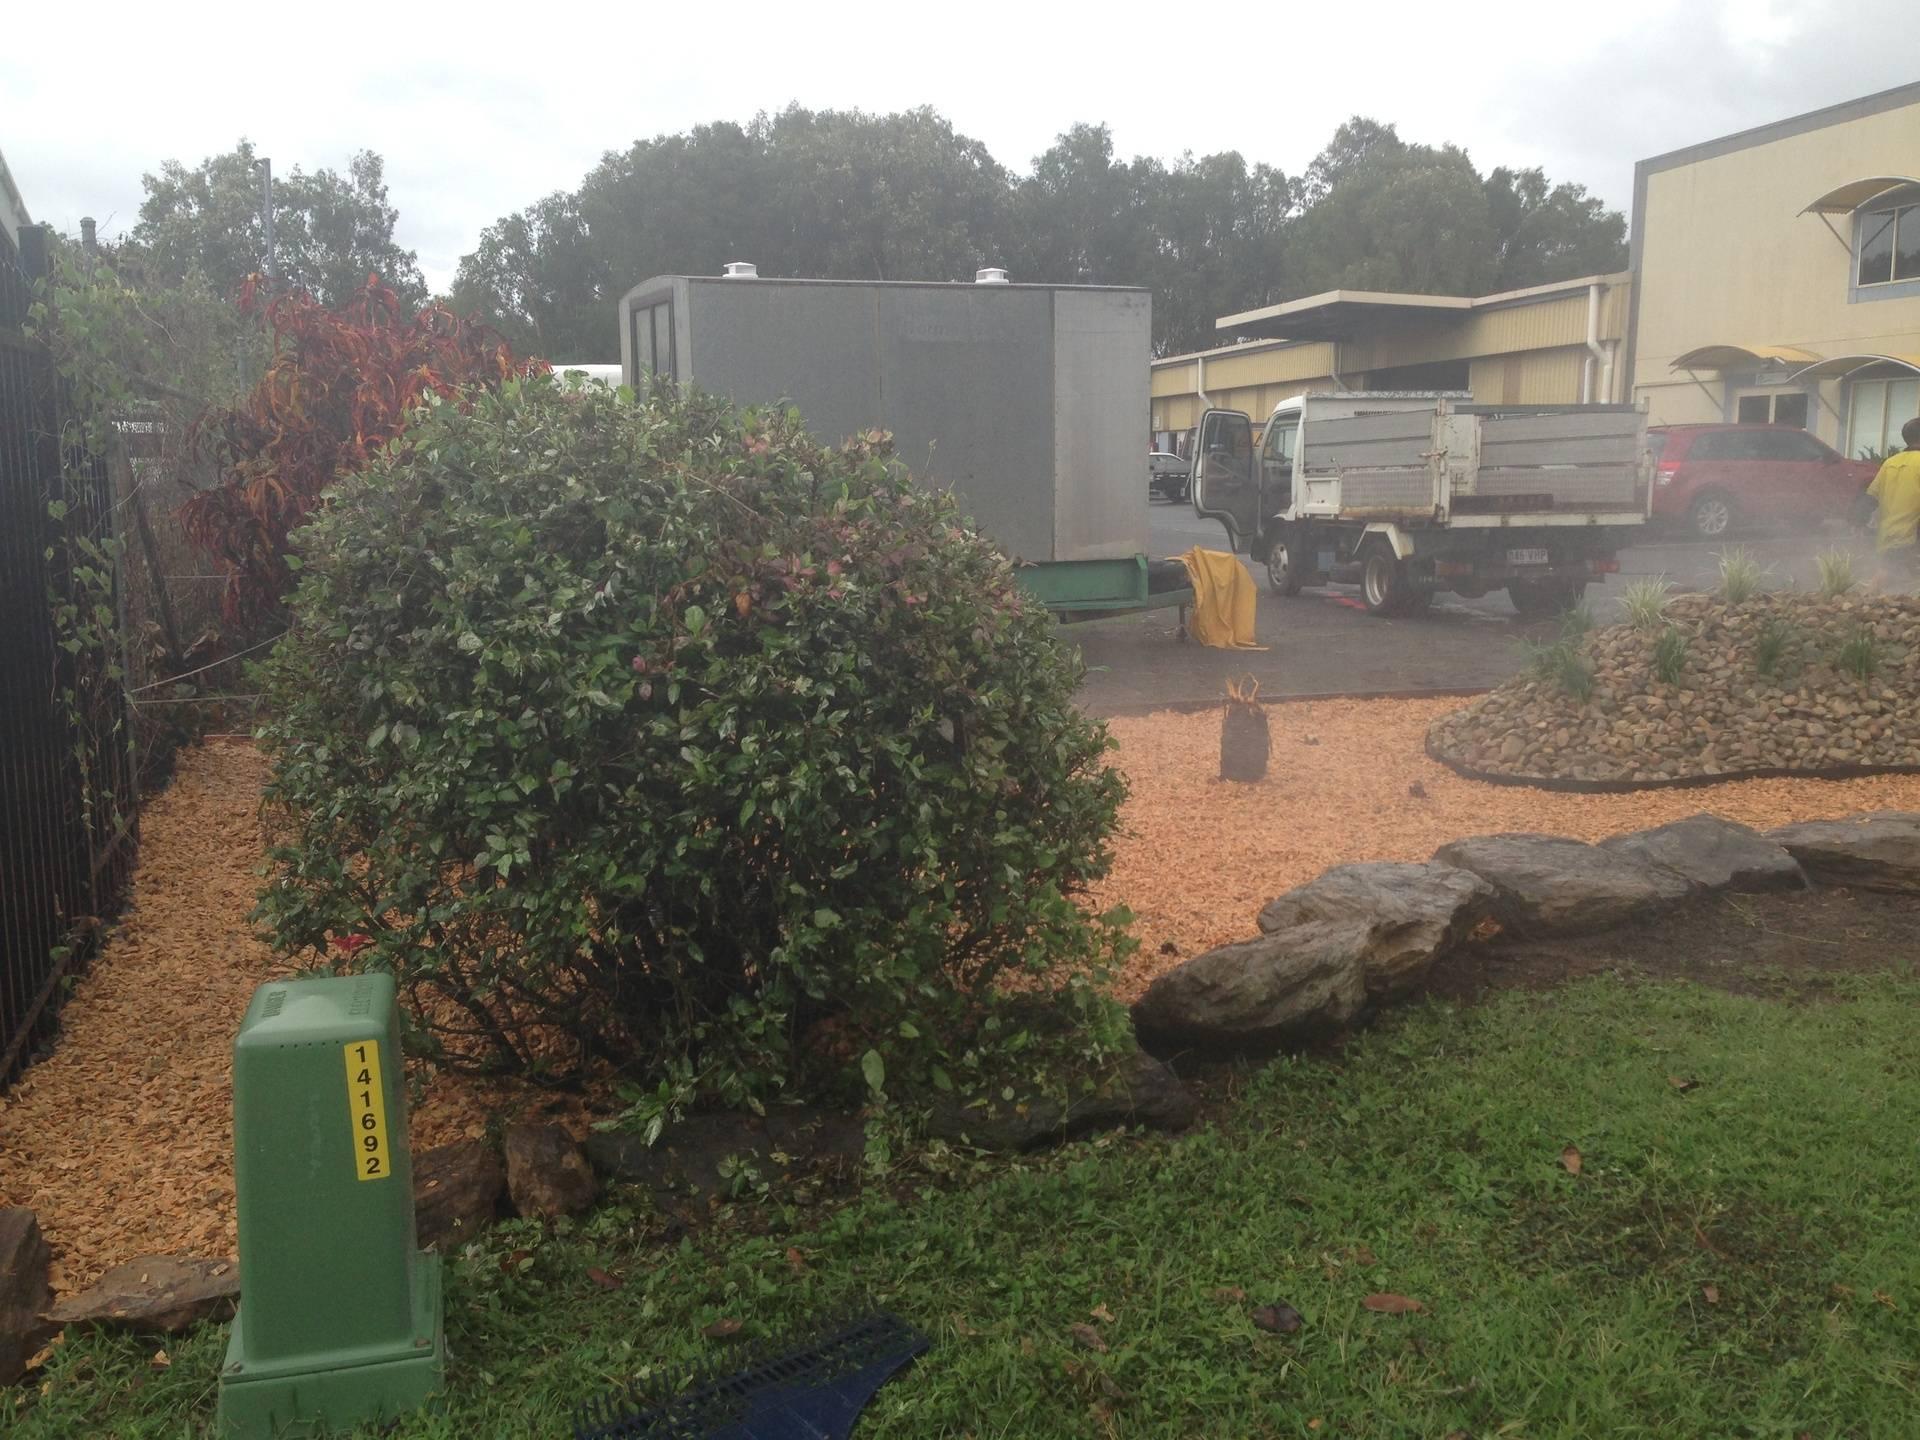 Landscaping / Irigation